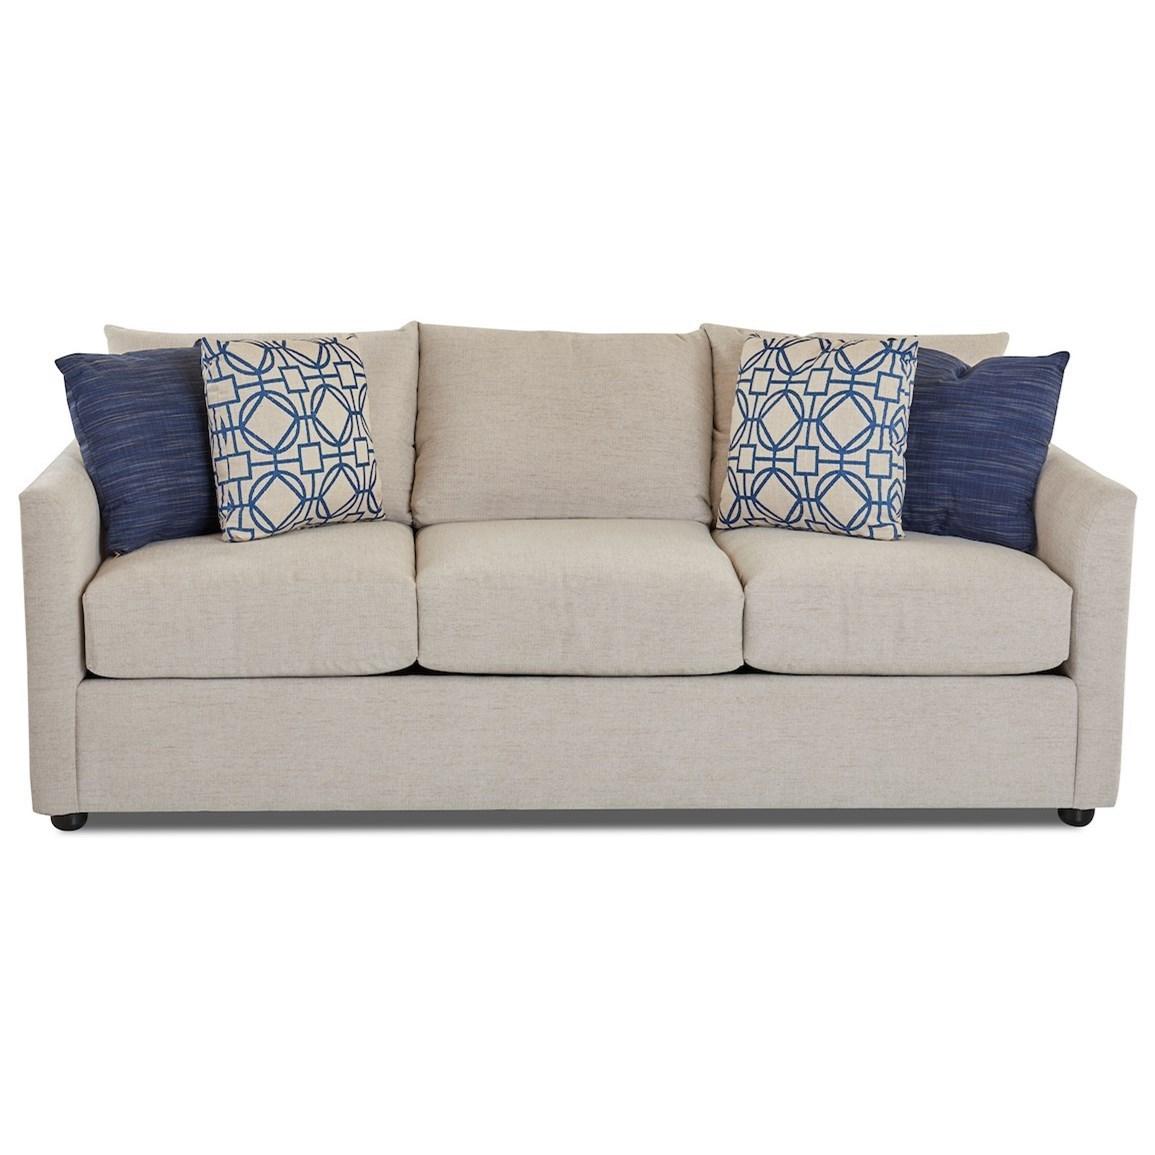 Atlanta Sleeper Sofa w/ Enso MemoryFoam Mattress by Klaussner at Northeast Factory Direct